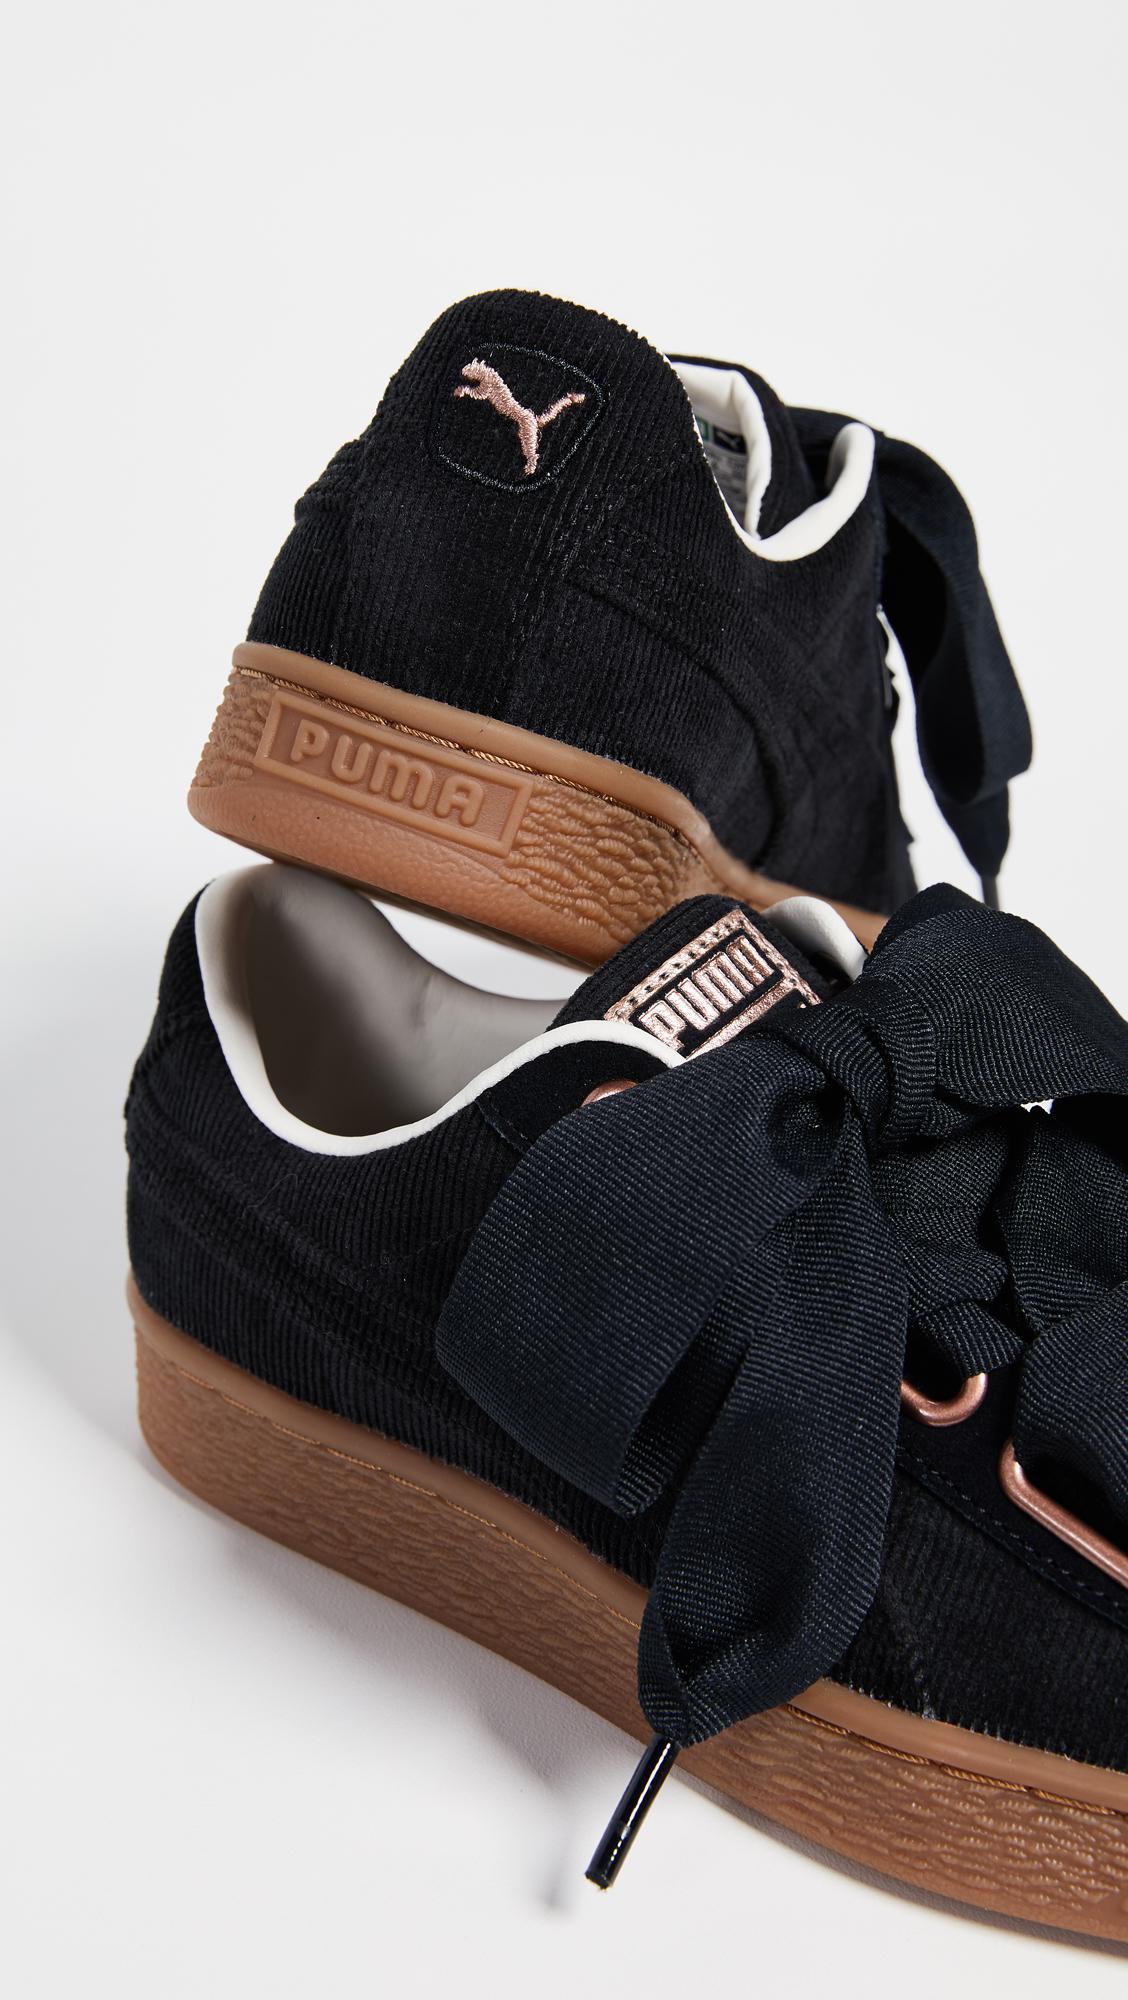 PUMA Basket Heart Corduroy Sneakers in